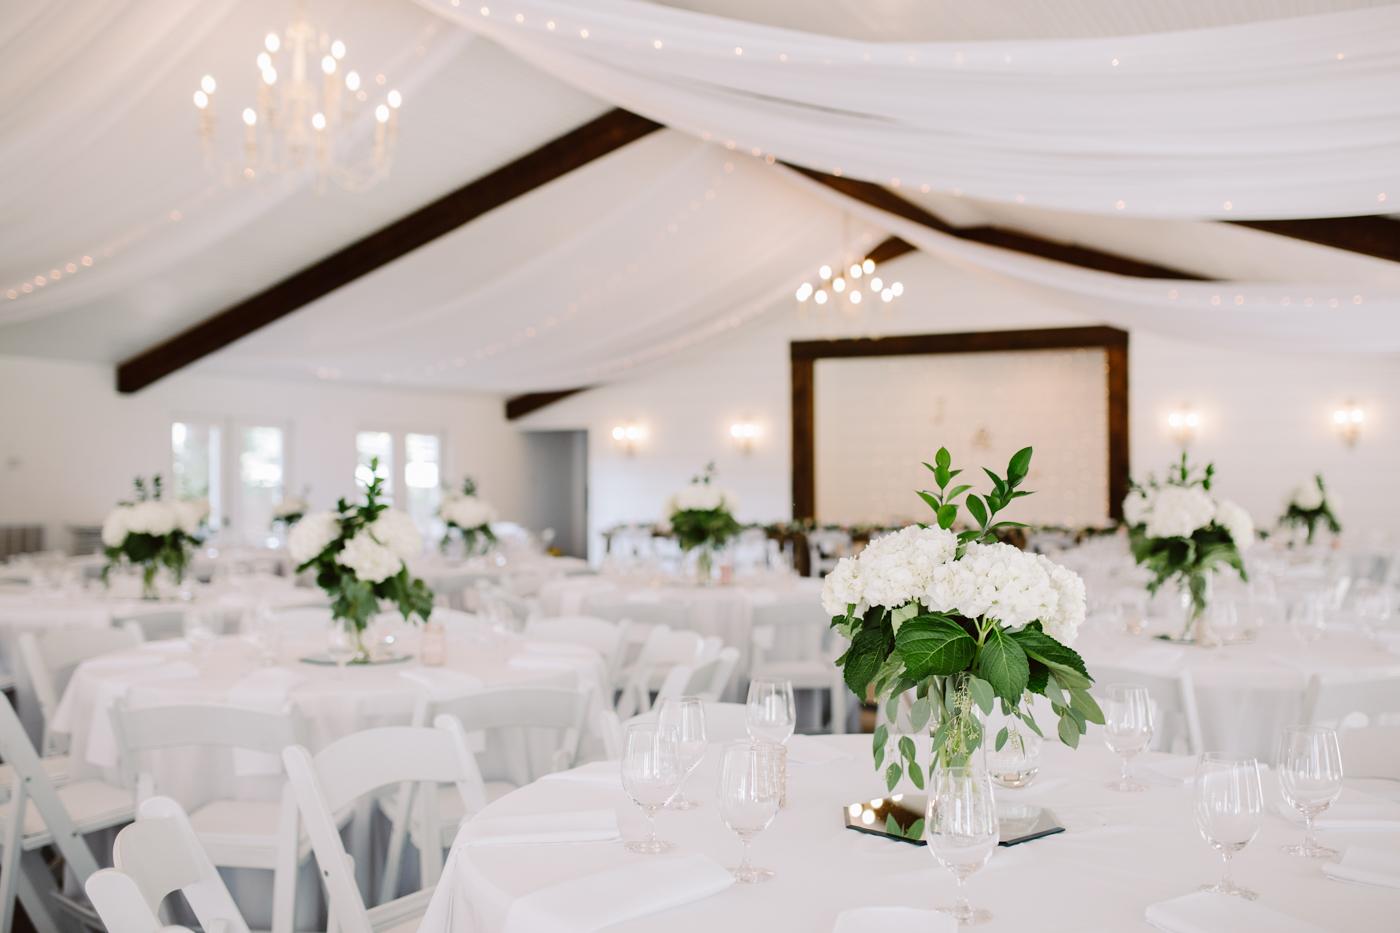 venue-at-twin-oaks-tennessee-wedding (2).jpg